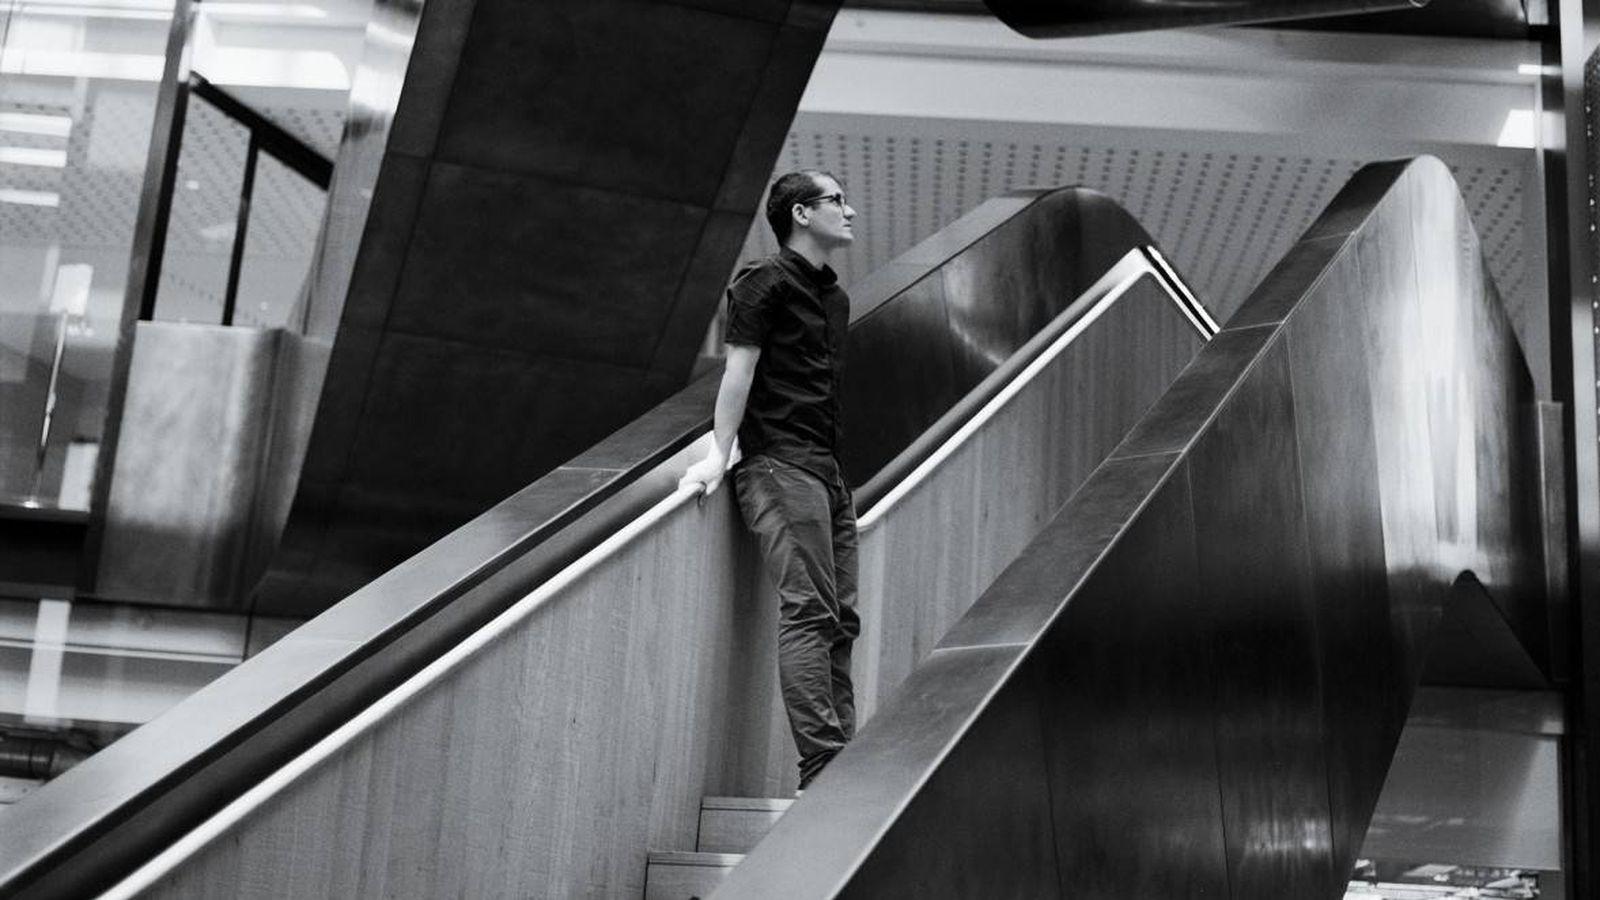 Foto: Oriol Vinyals, investigador de inteligencia artificial en Google DeepMind. (Foto: MIT Technology Review)